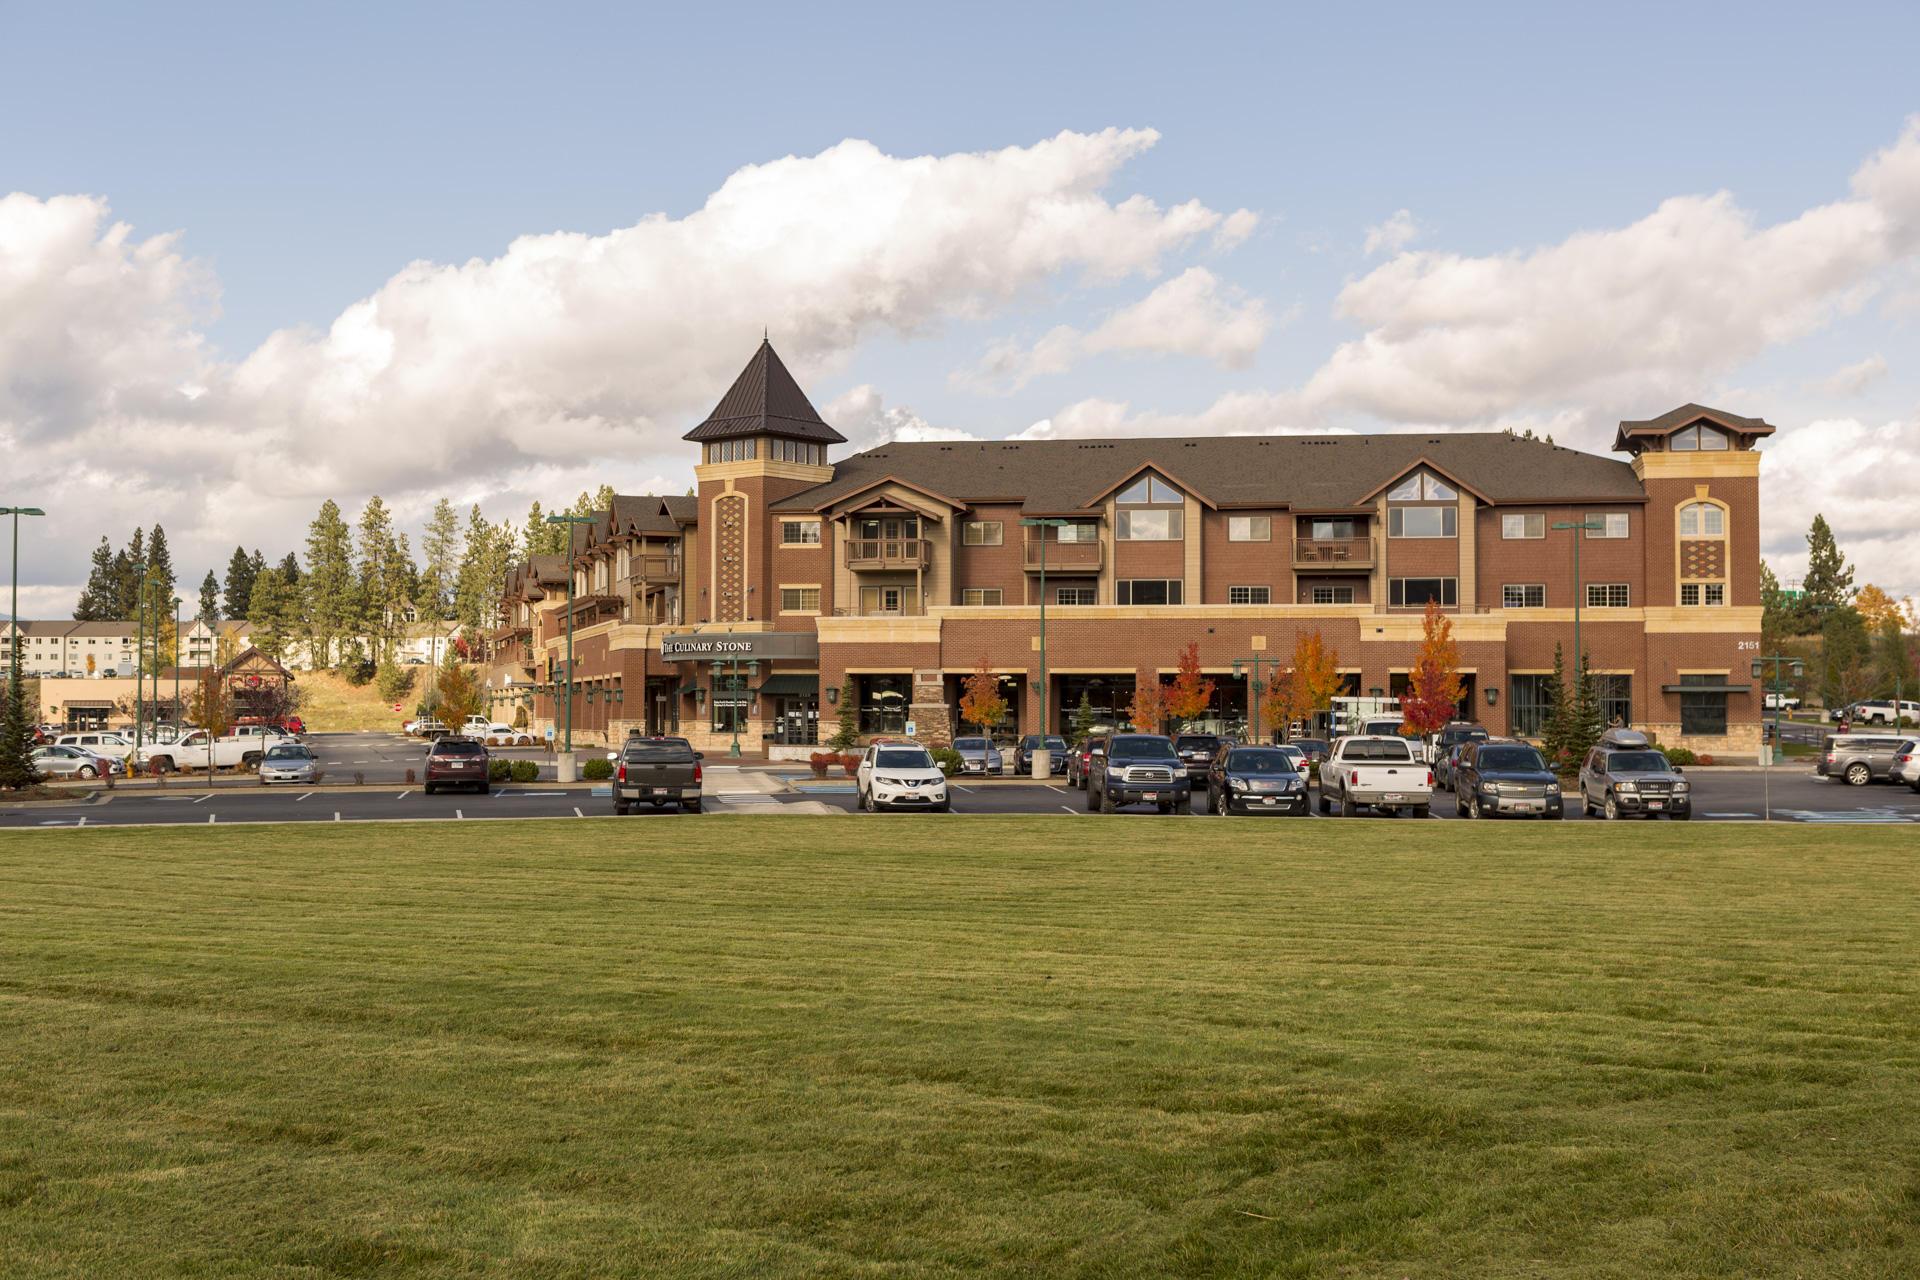 photo of  W RIVERSTONE DR Coeur d'Alene Idaho 83814